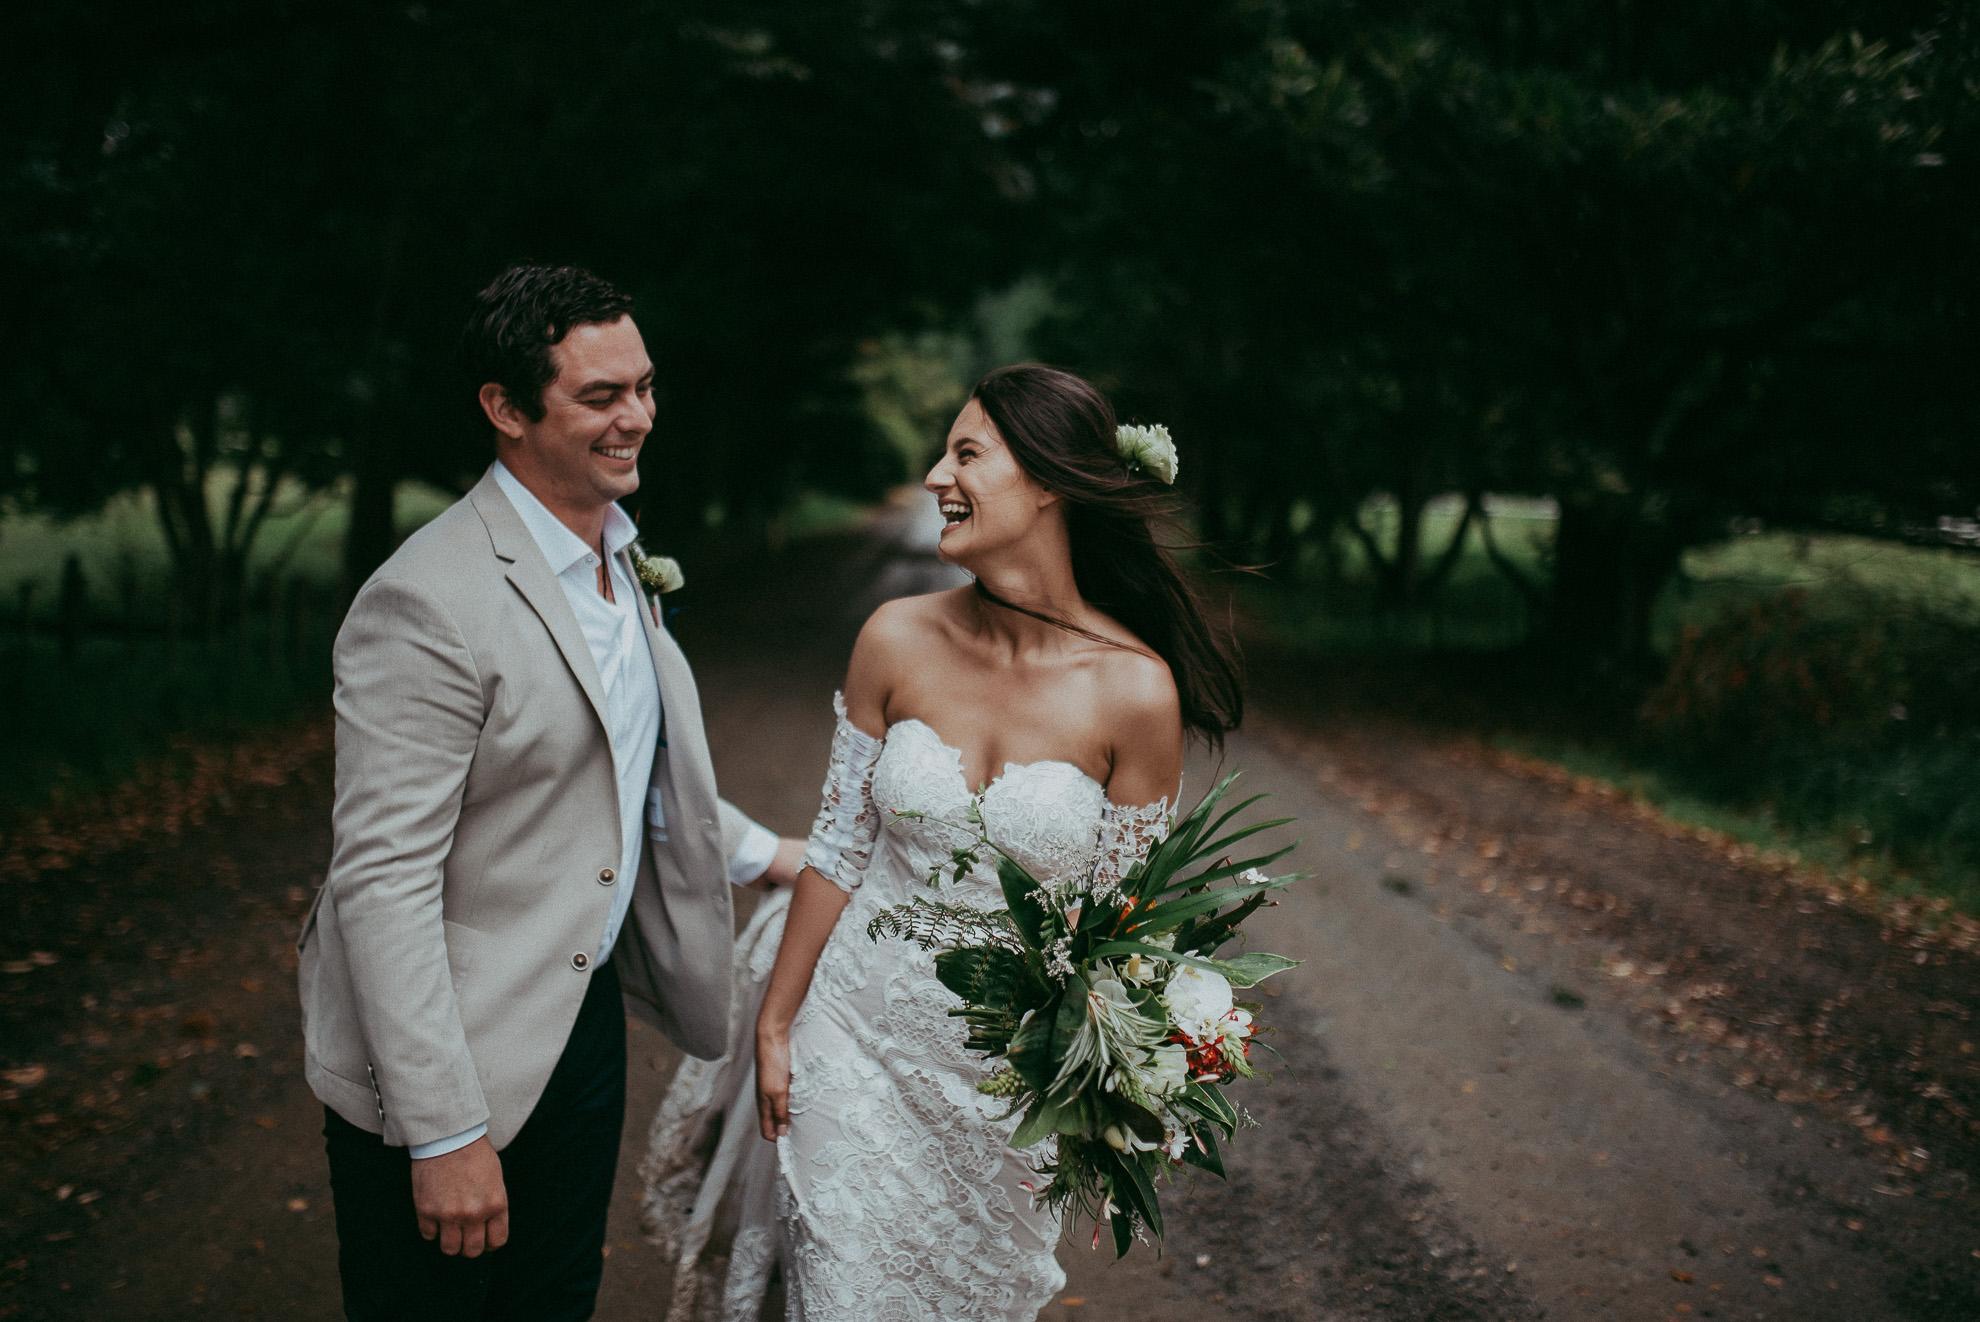 wedding-by-levien-667.JPG